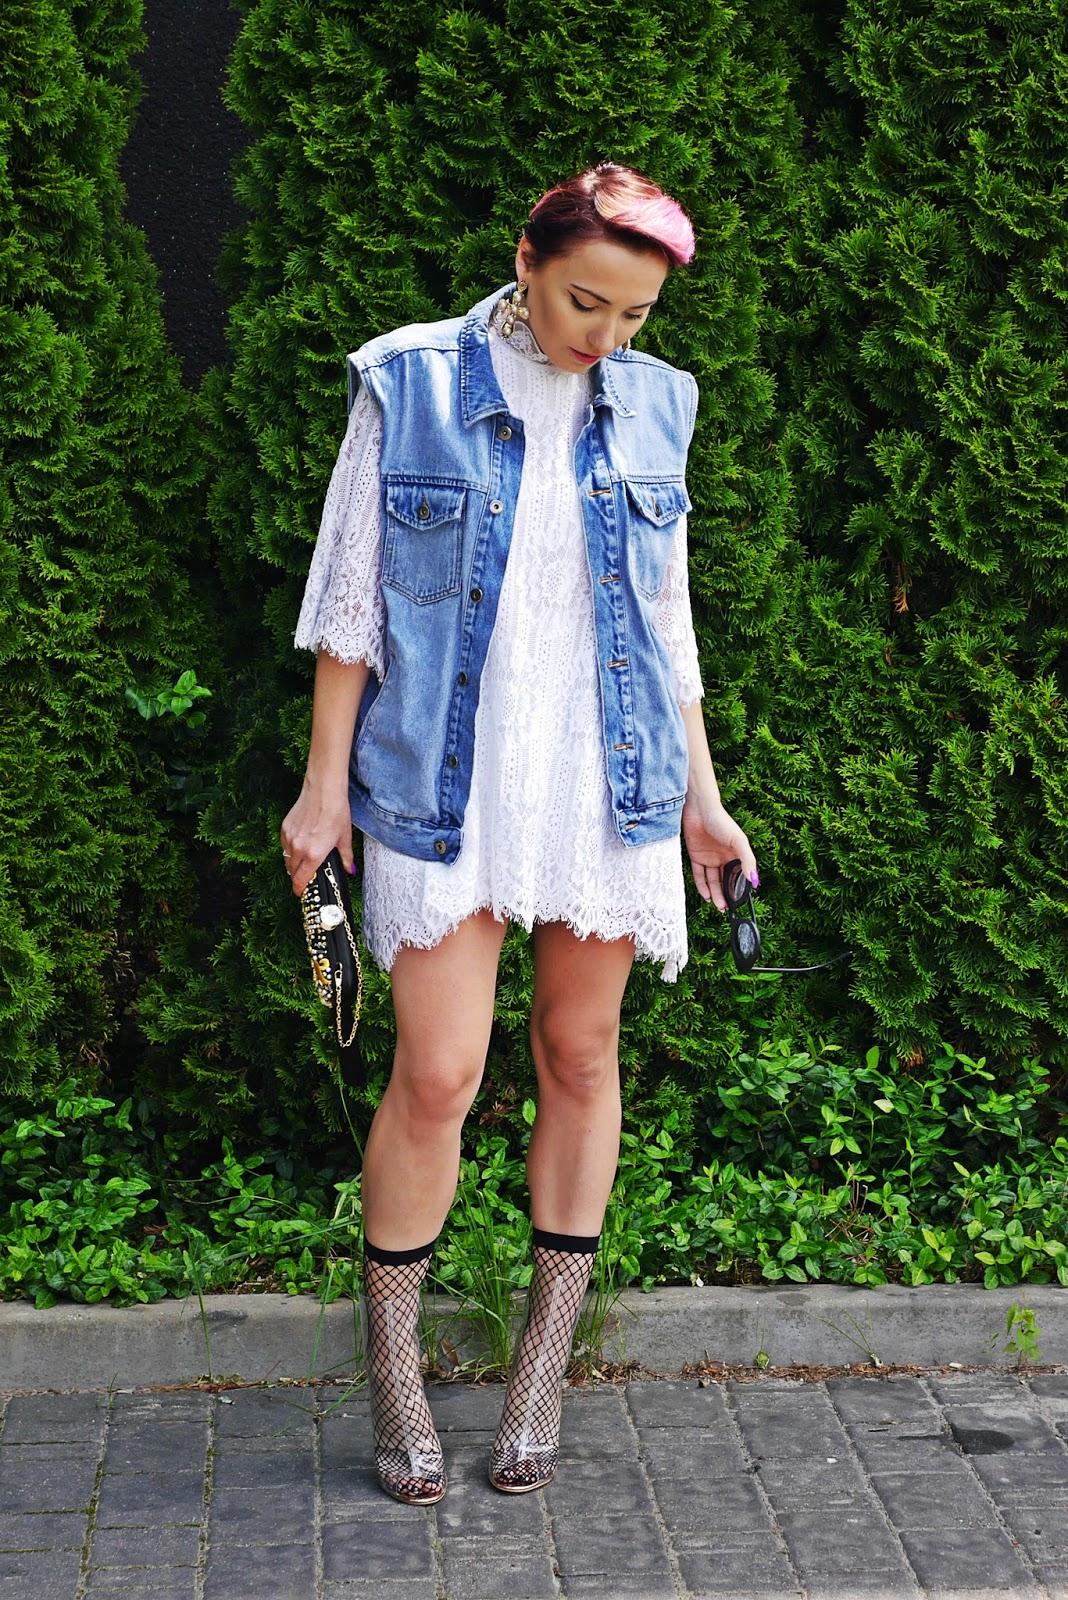 lace_dress_transparent_yezzy_shoes_karyn_blog_modowy_oversize_denim_220617d